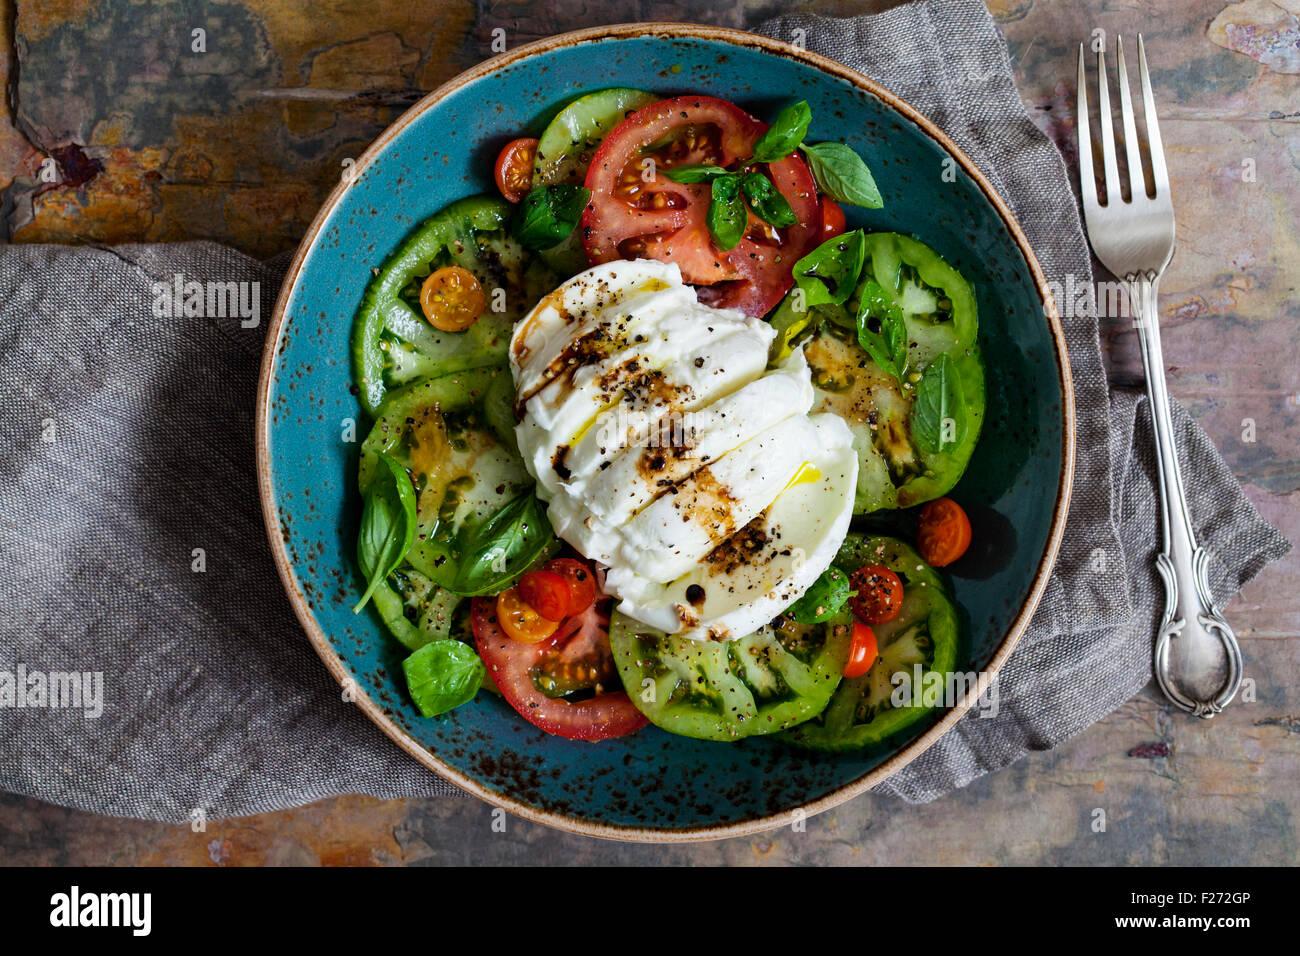 Tomatoes, mozzarella and basil salad - Stock Image